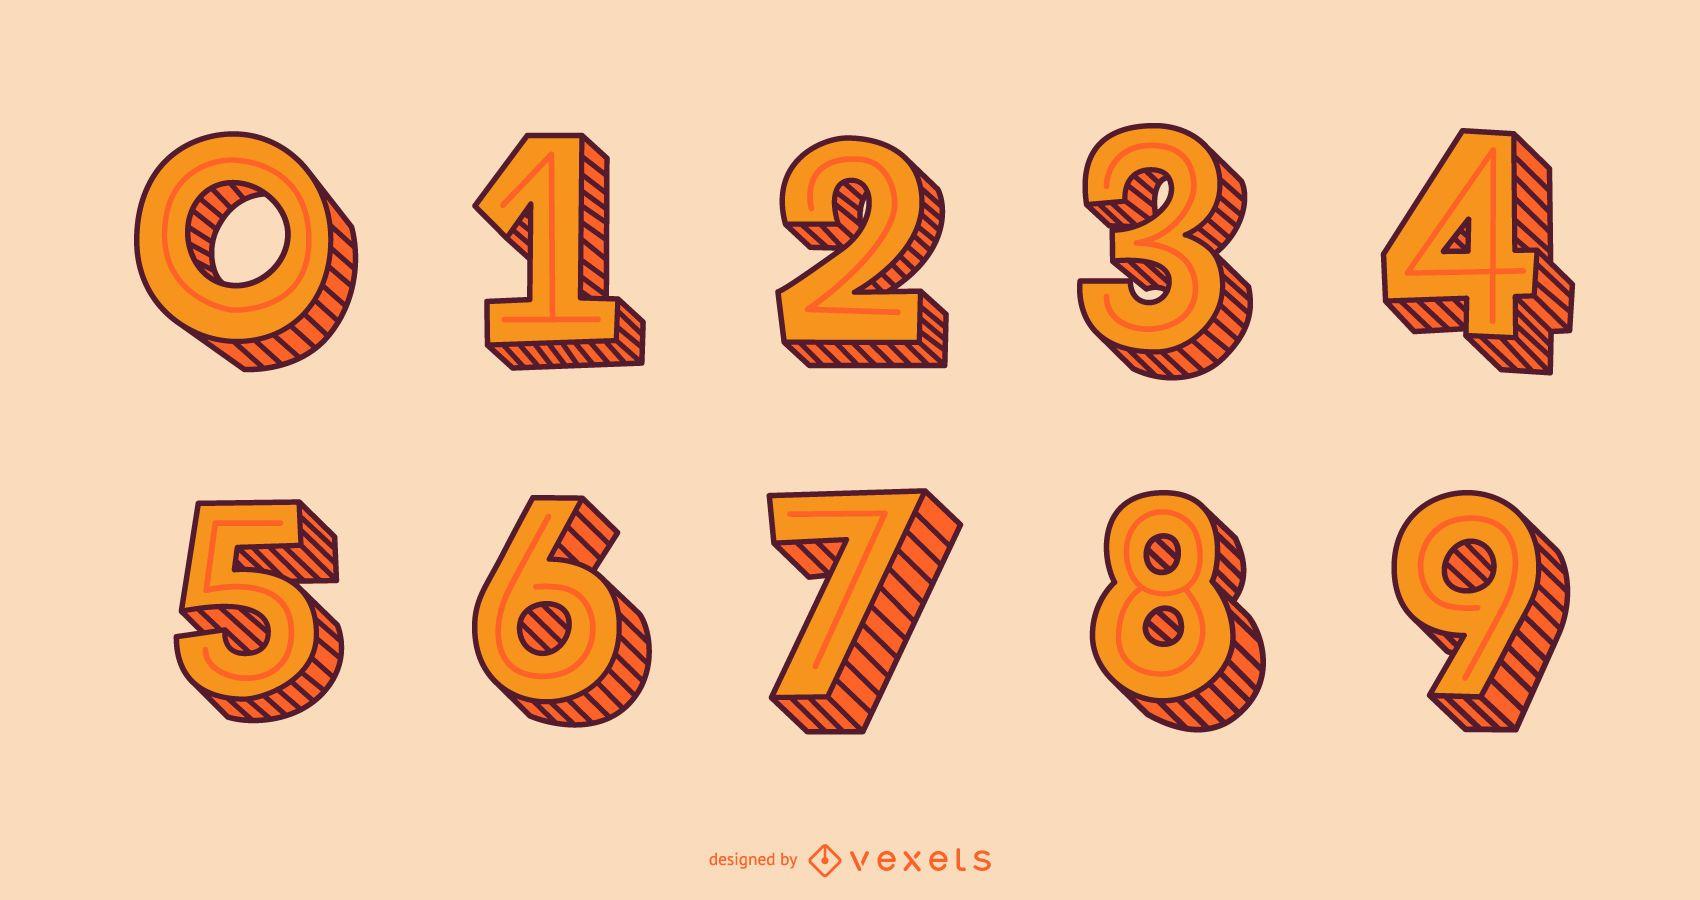 3D Stroke Style Alphabet Number Set